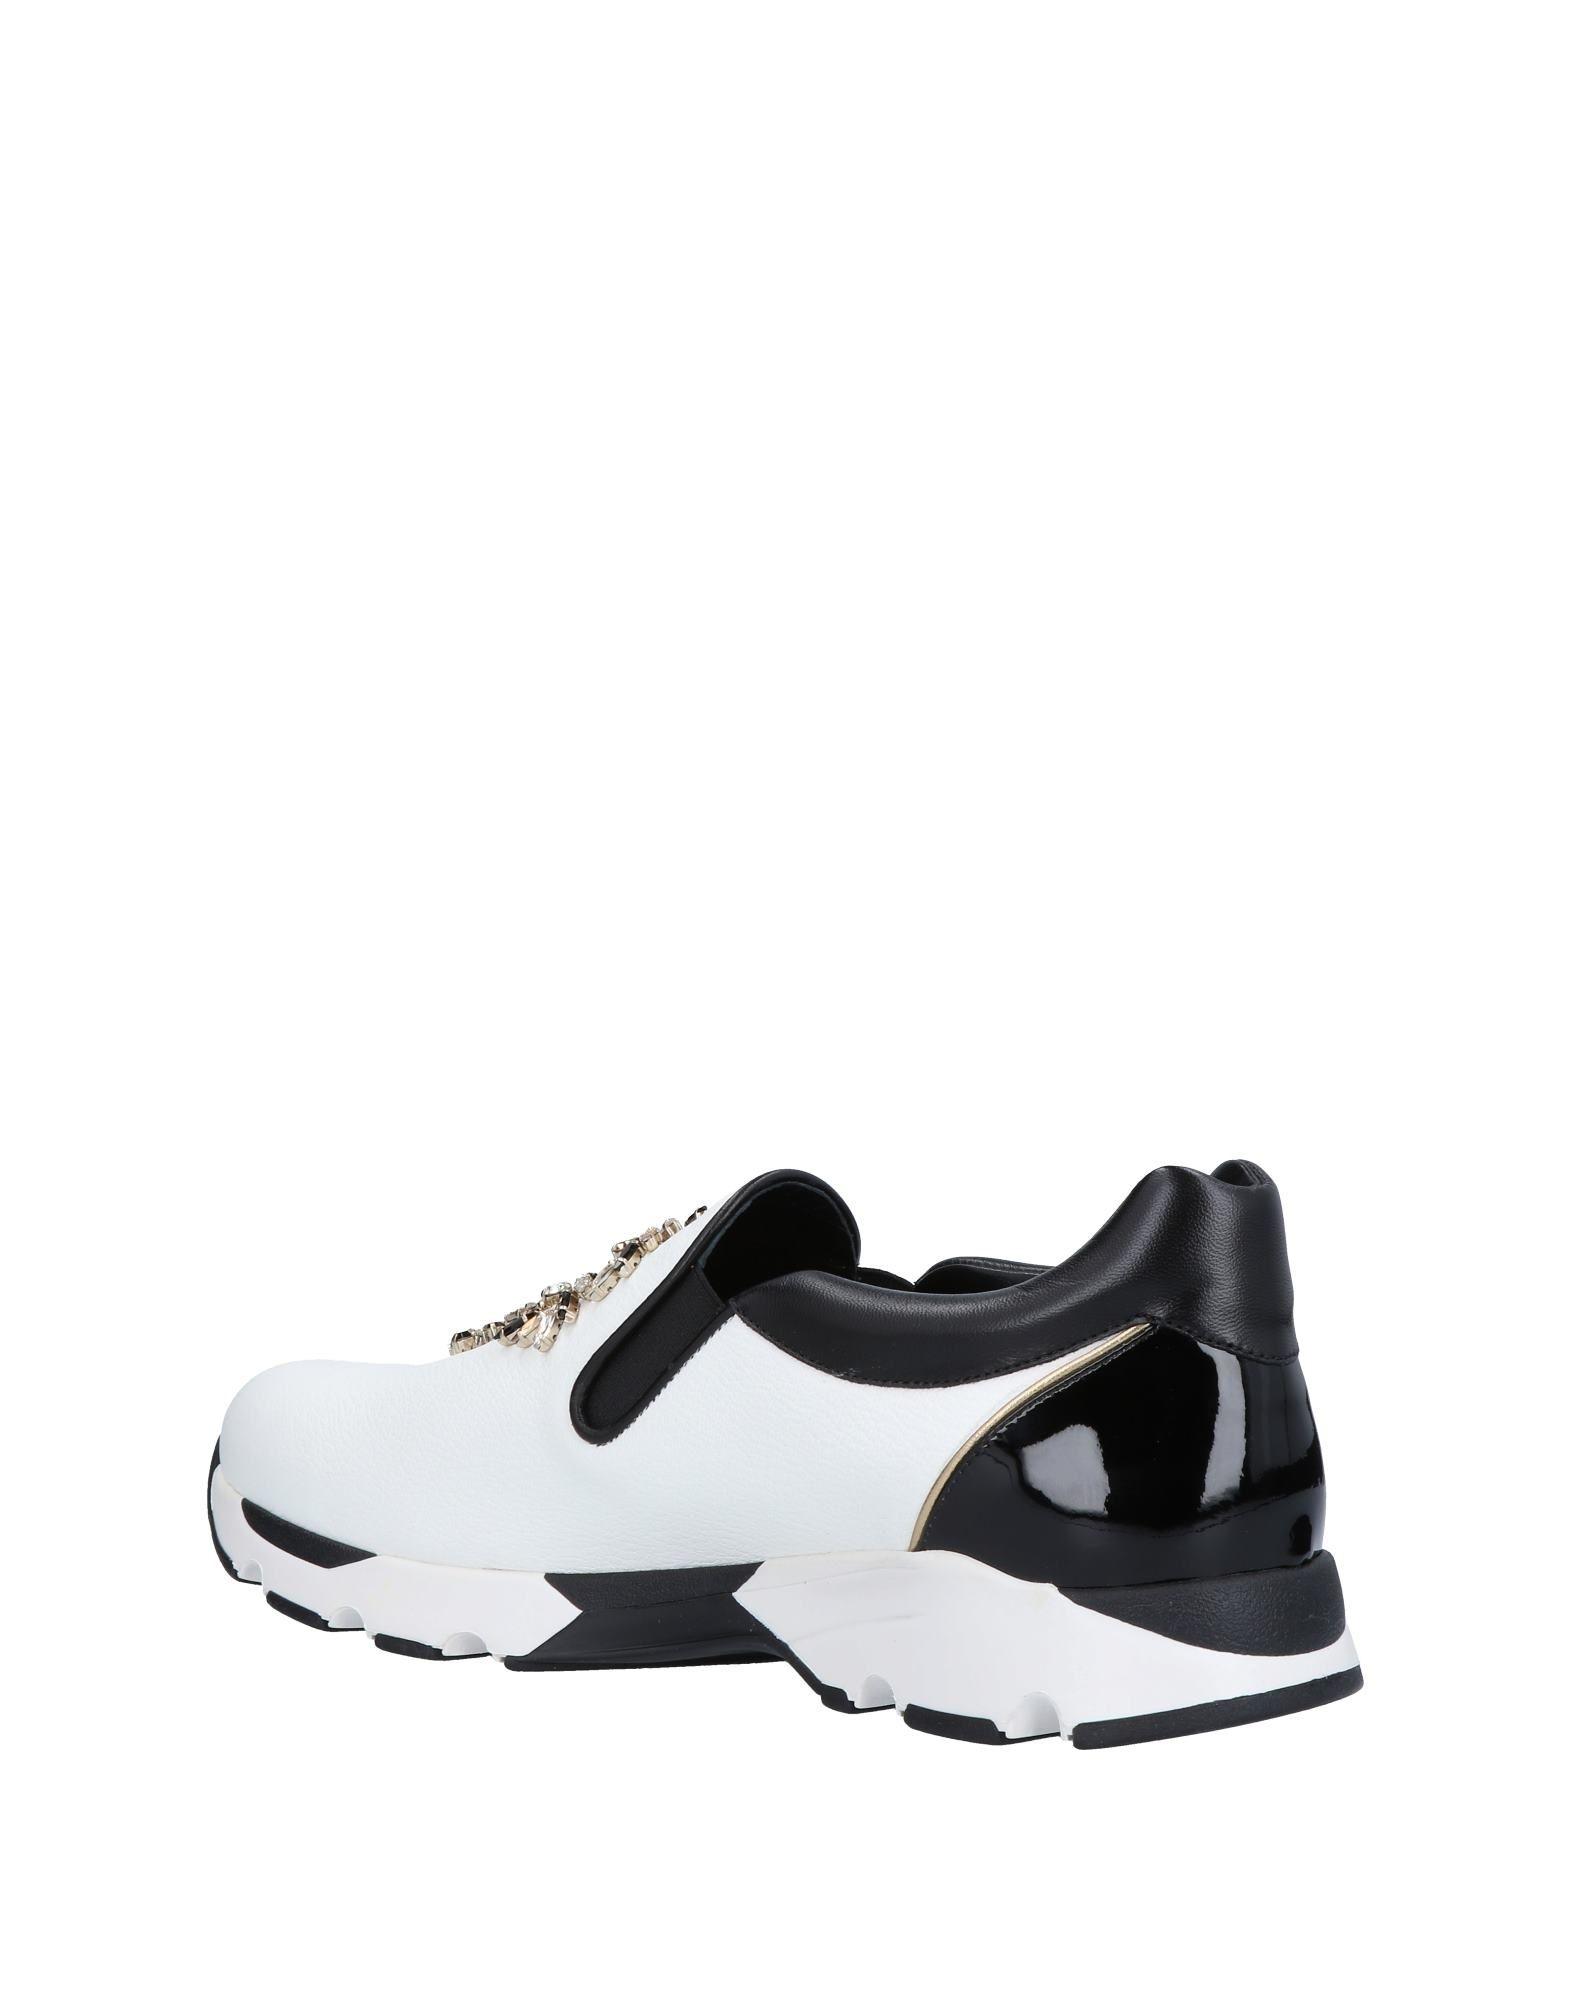 Rene' Caovilla gut Sneakers Damen  11485492DOGünstige gut Caovilla aussehende Schuhe 031cc5